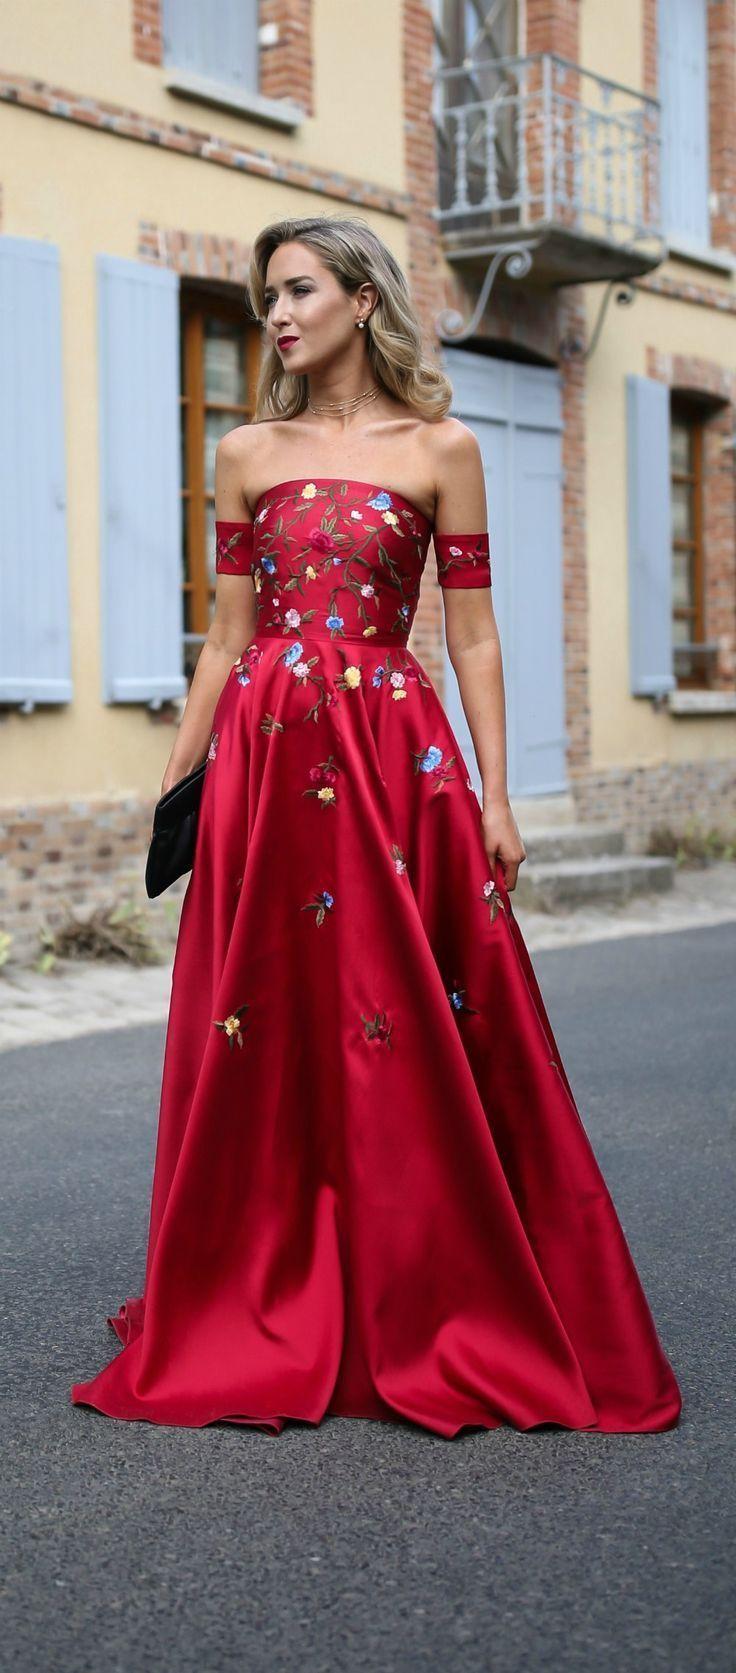 best formal dresses images on pinterest outfits senior prom